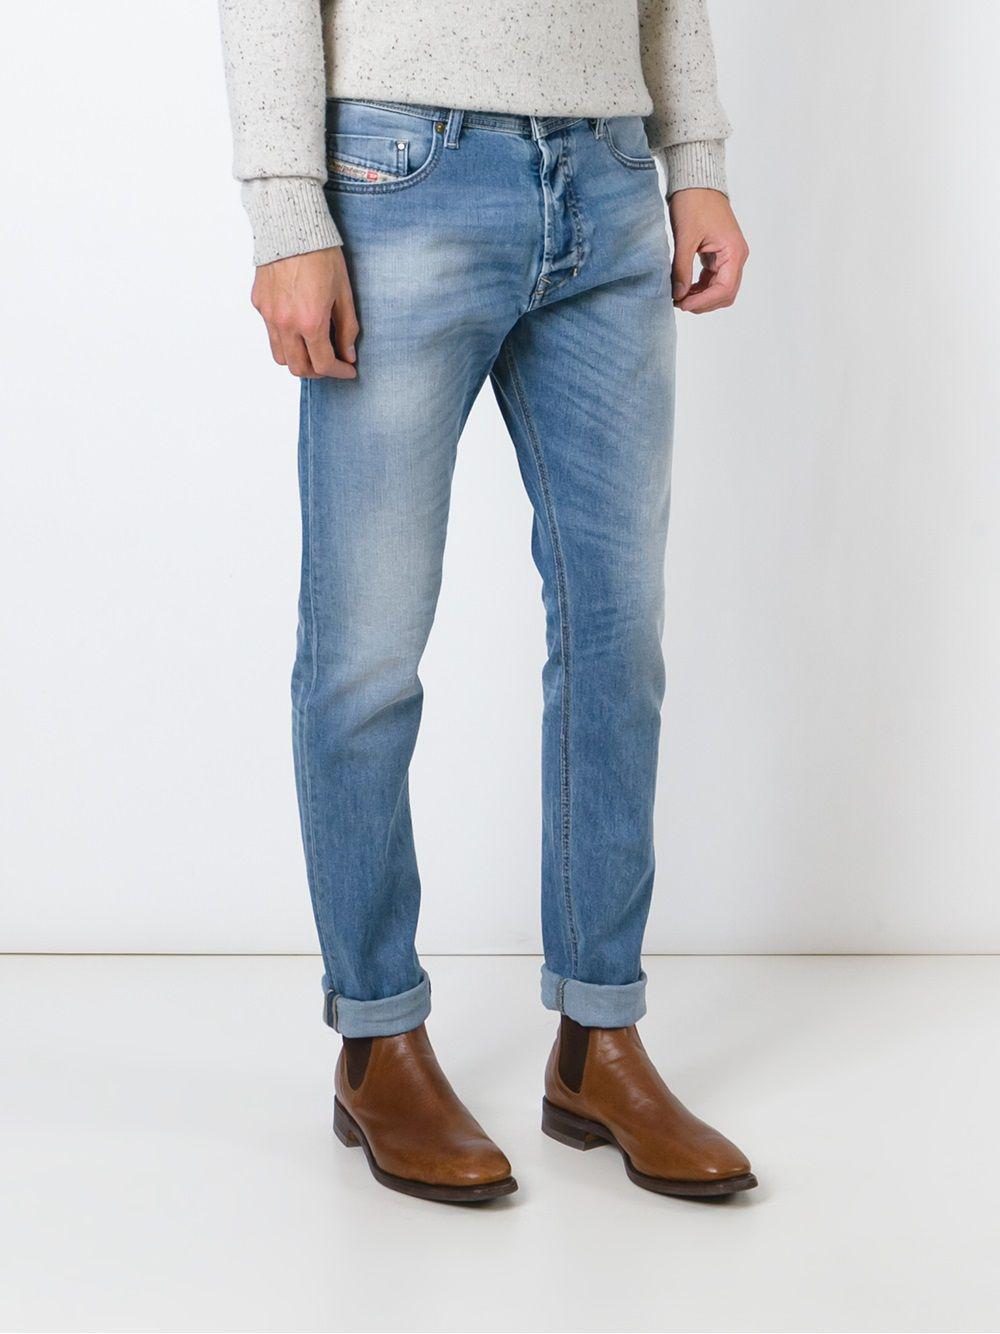 0defc8eac44f57 DIESEL 'tepphar 0842h' Jeans in Blue for Men - Lyst